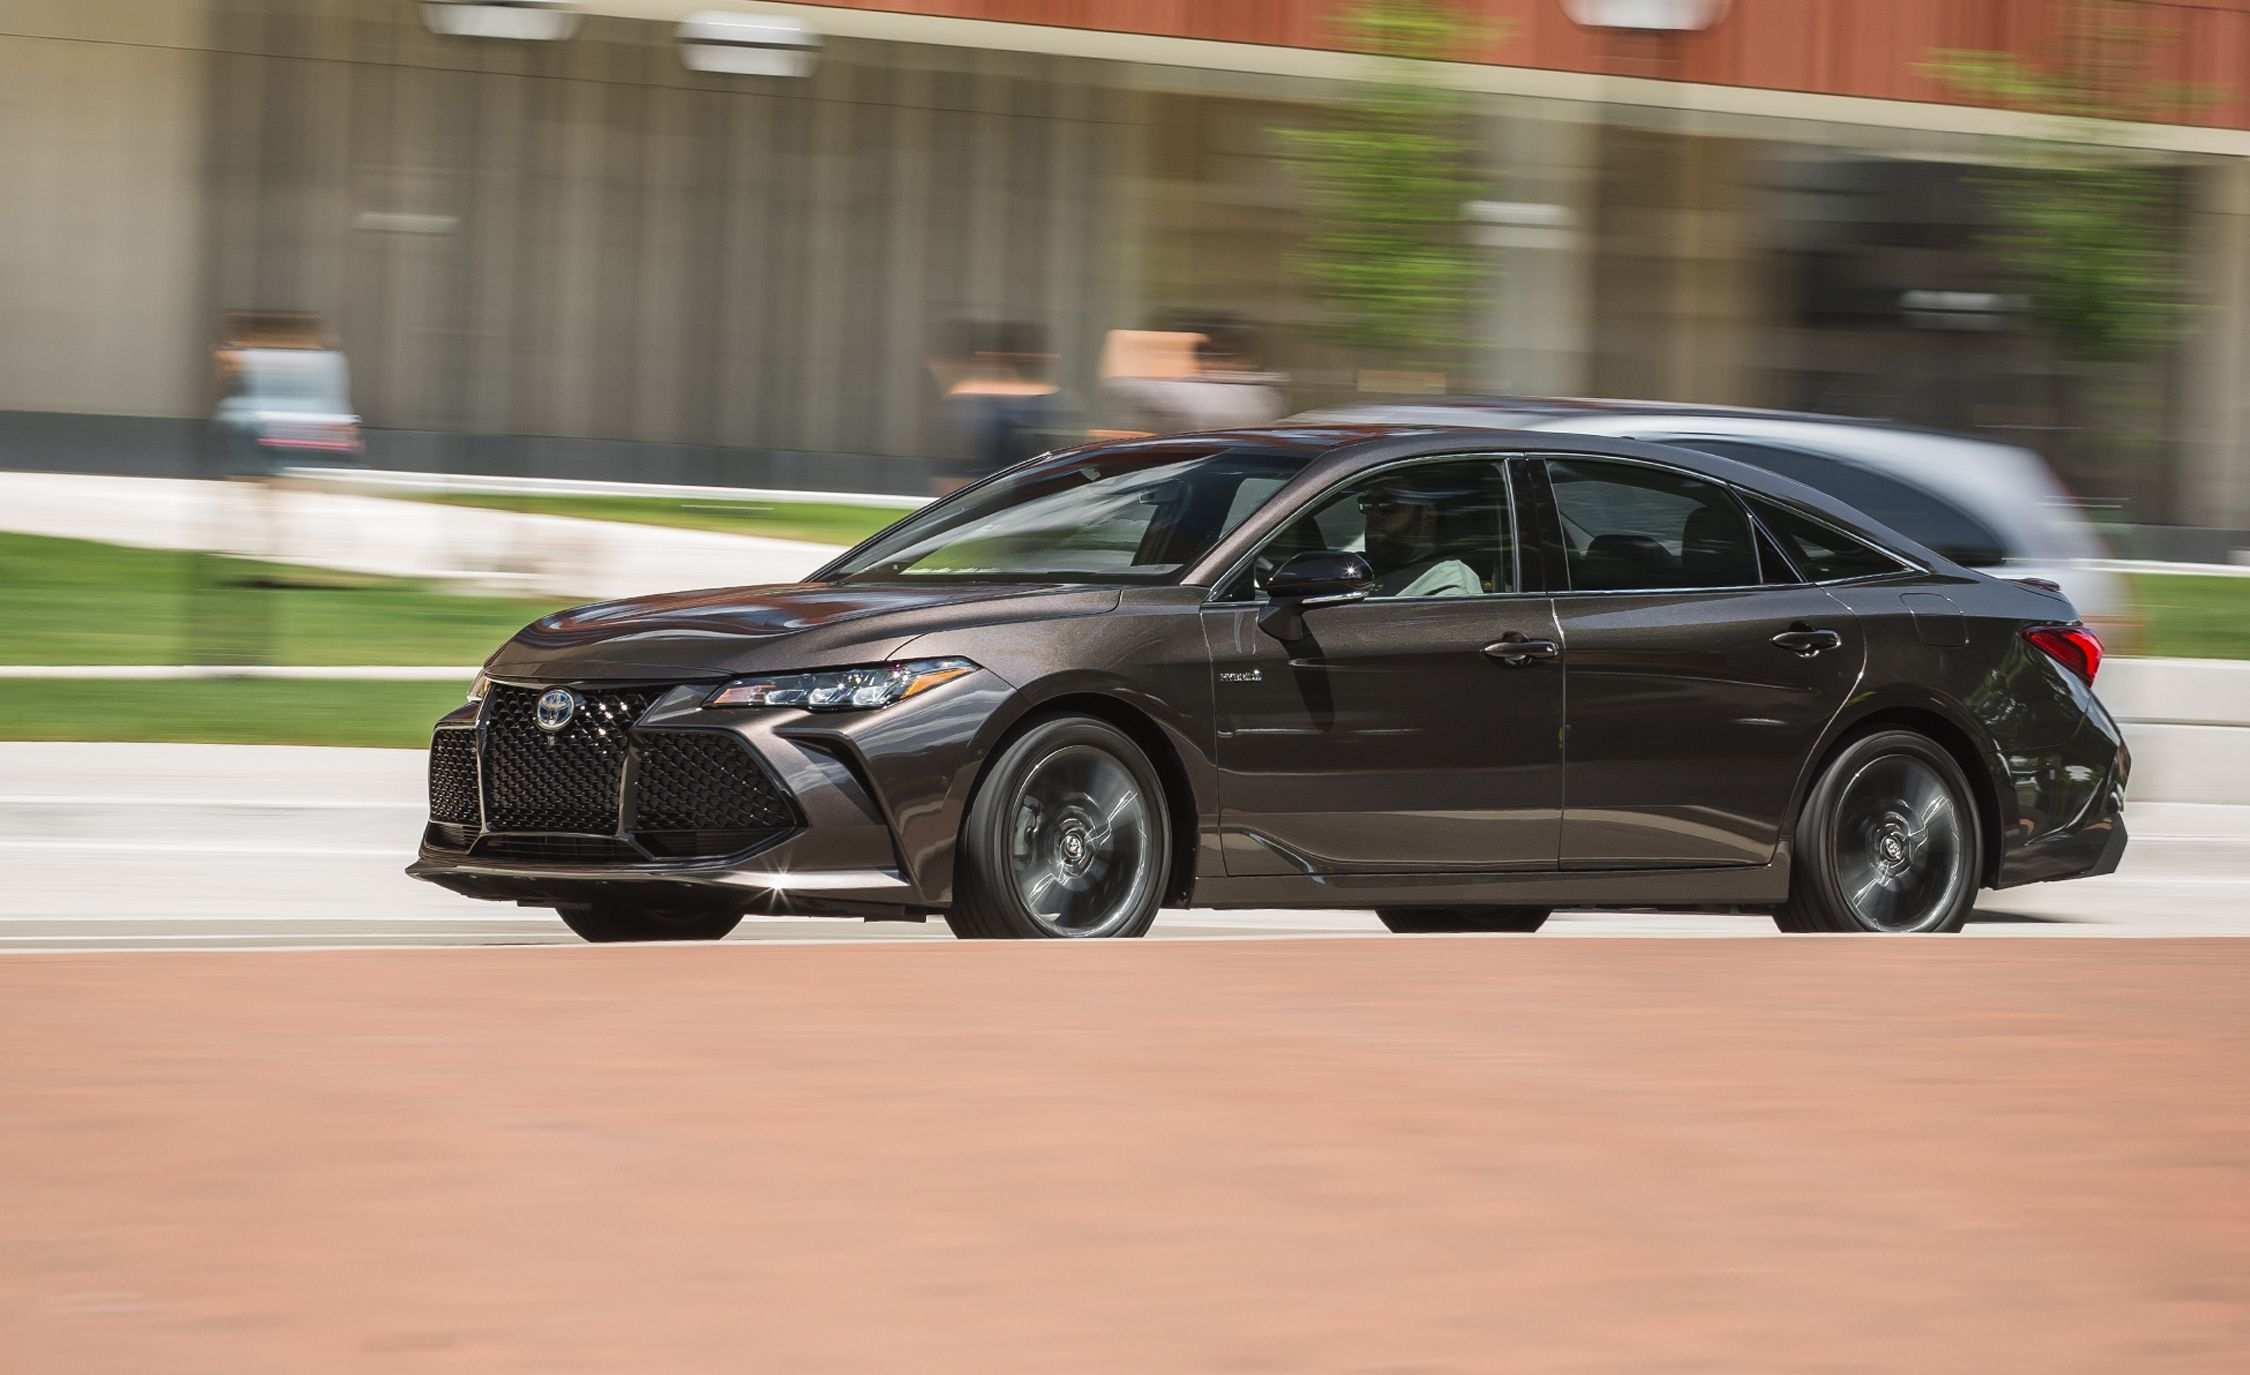 37 The New Lexus Vs Avalon 2019 Performance Configurations for New Lexus Vs Avalon 2019 Performance